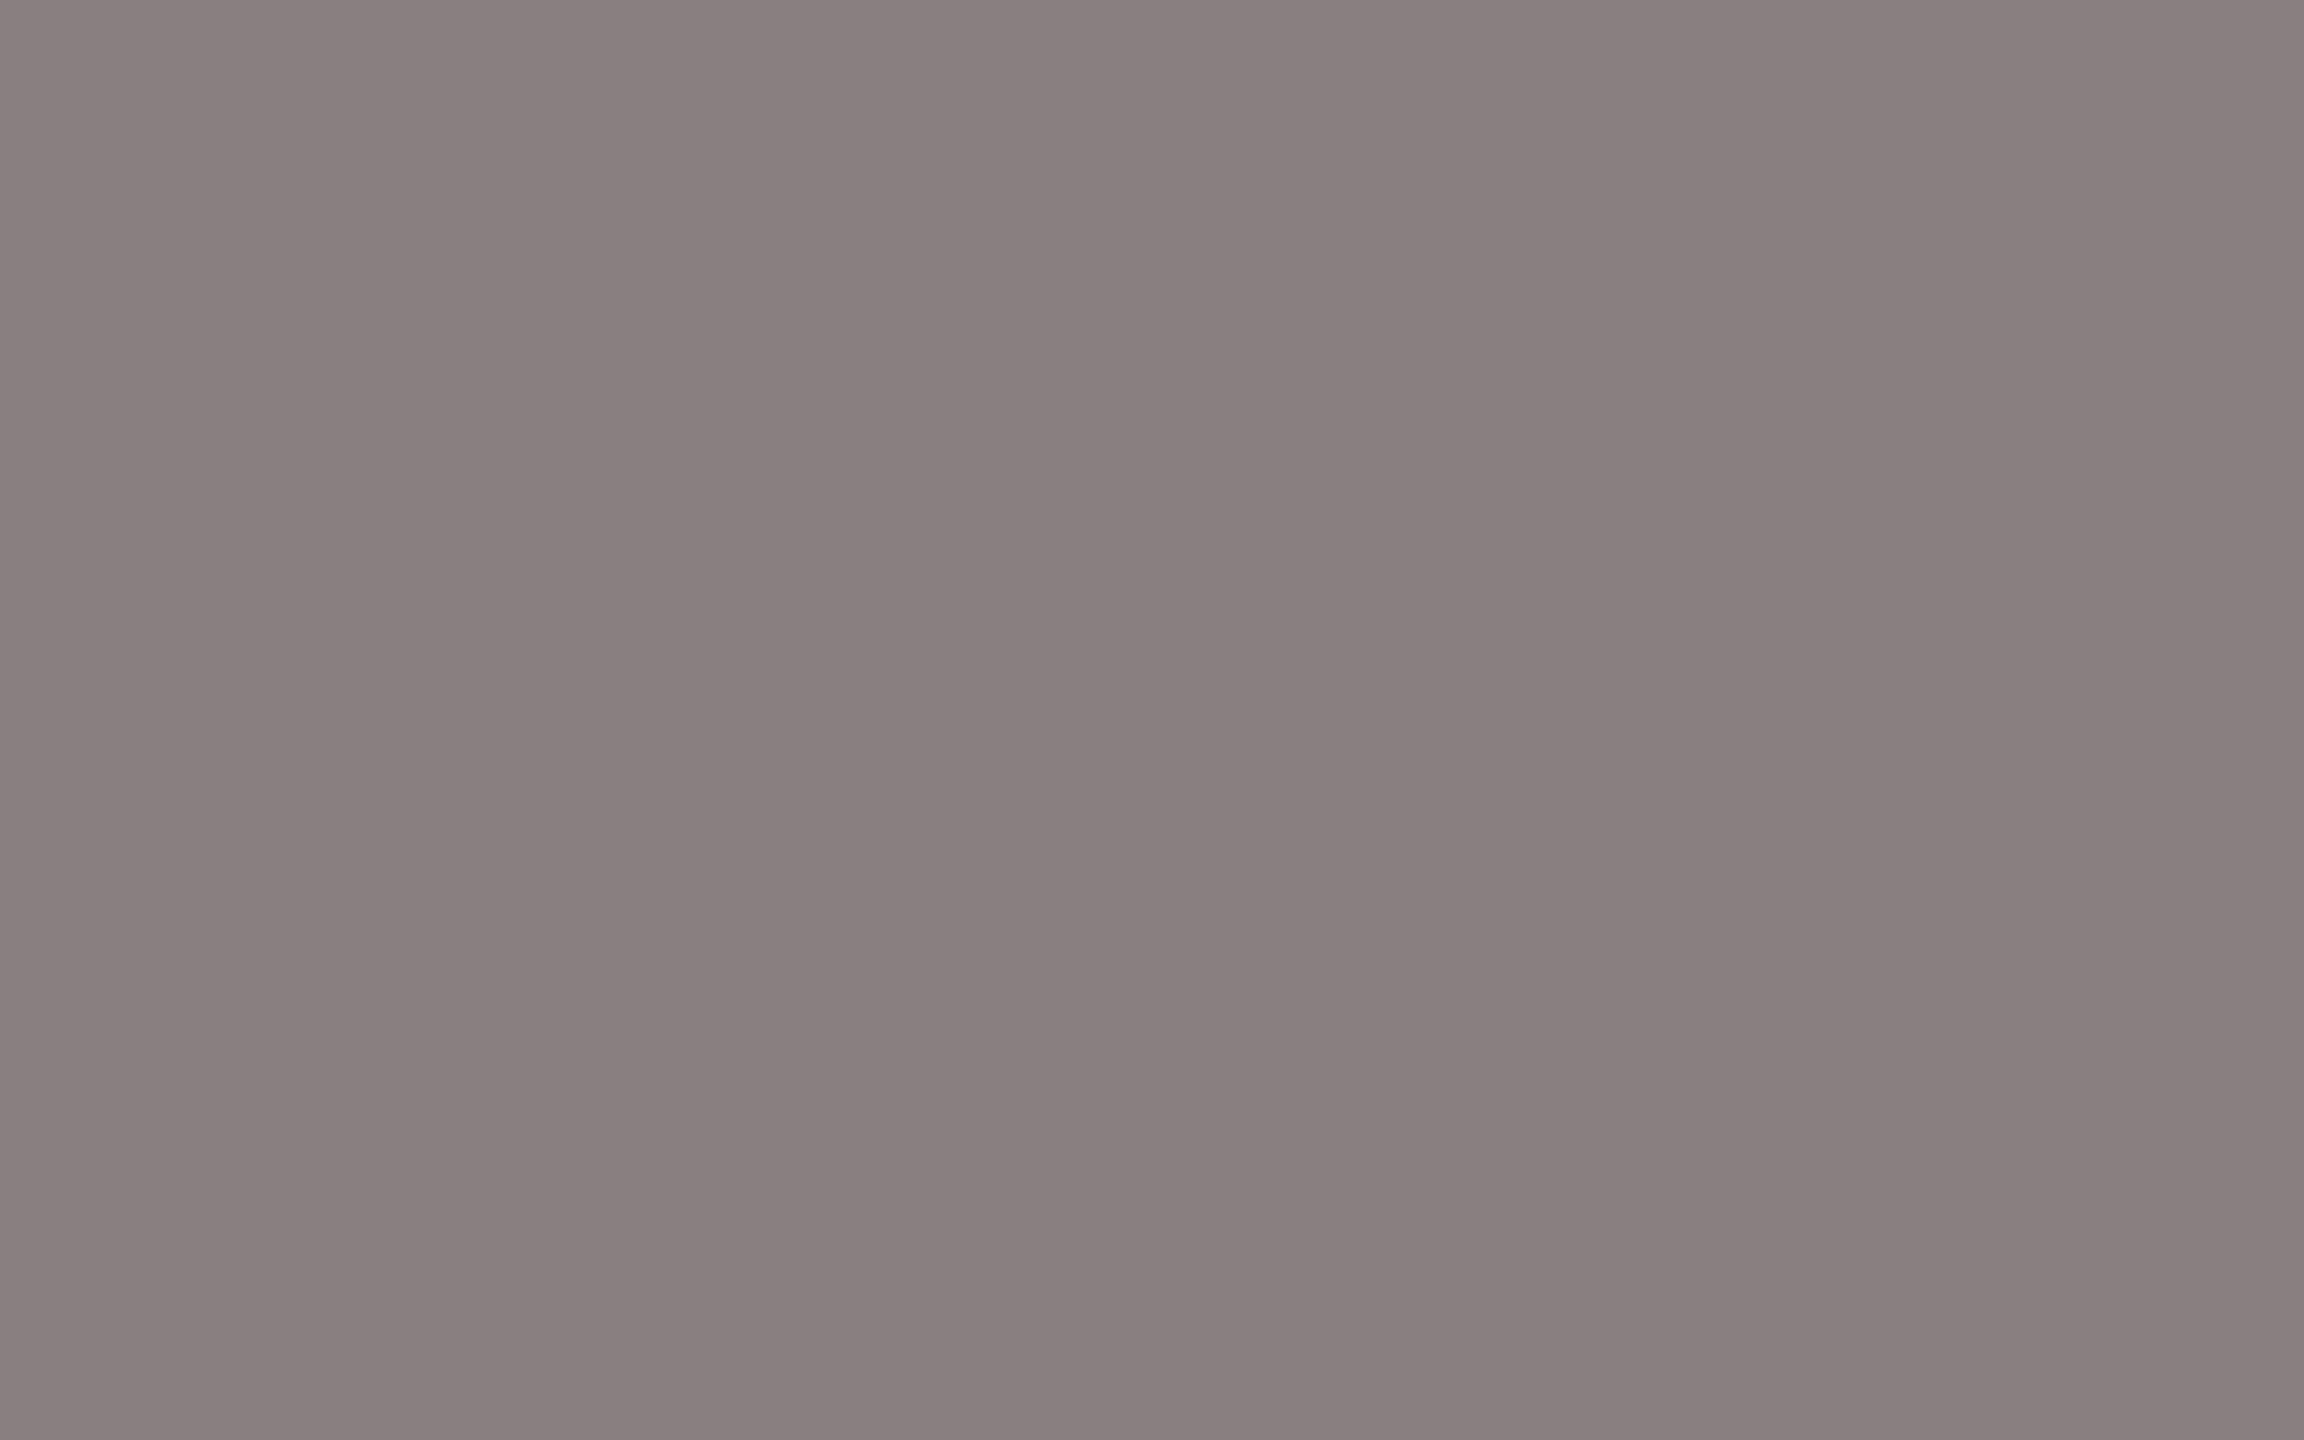 2304x1440 Rocket Metallic Solid Color Background